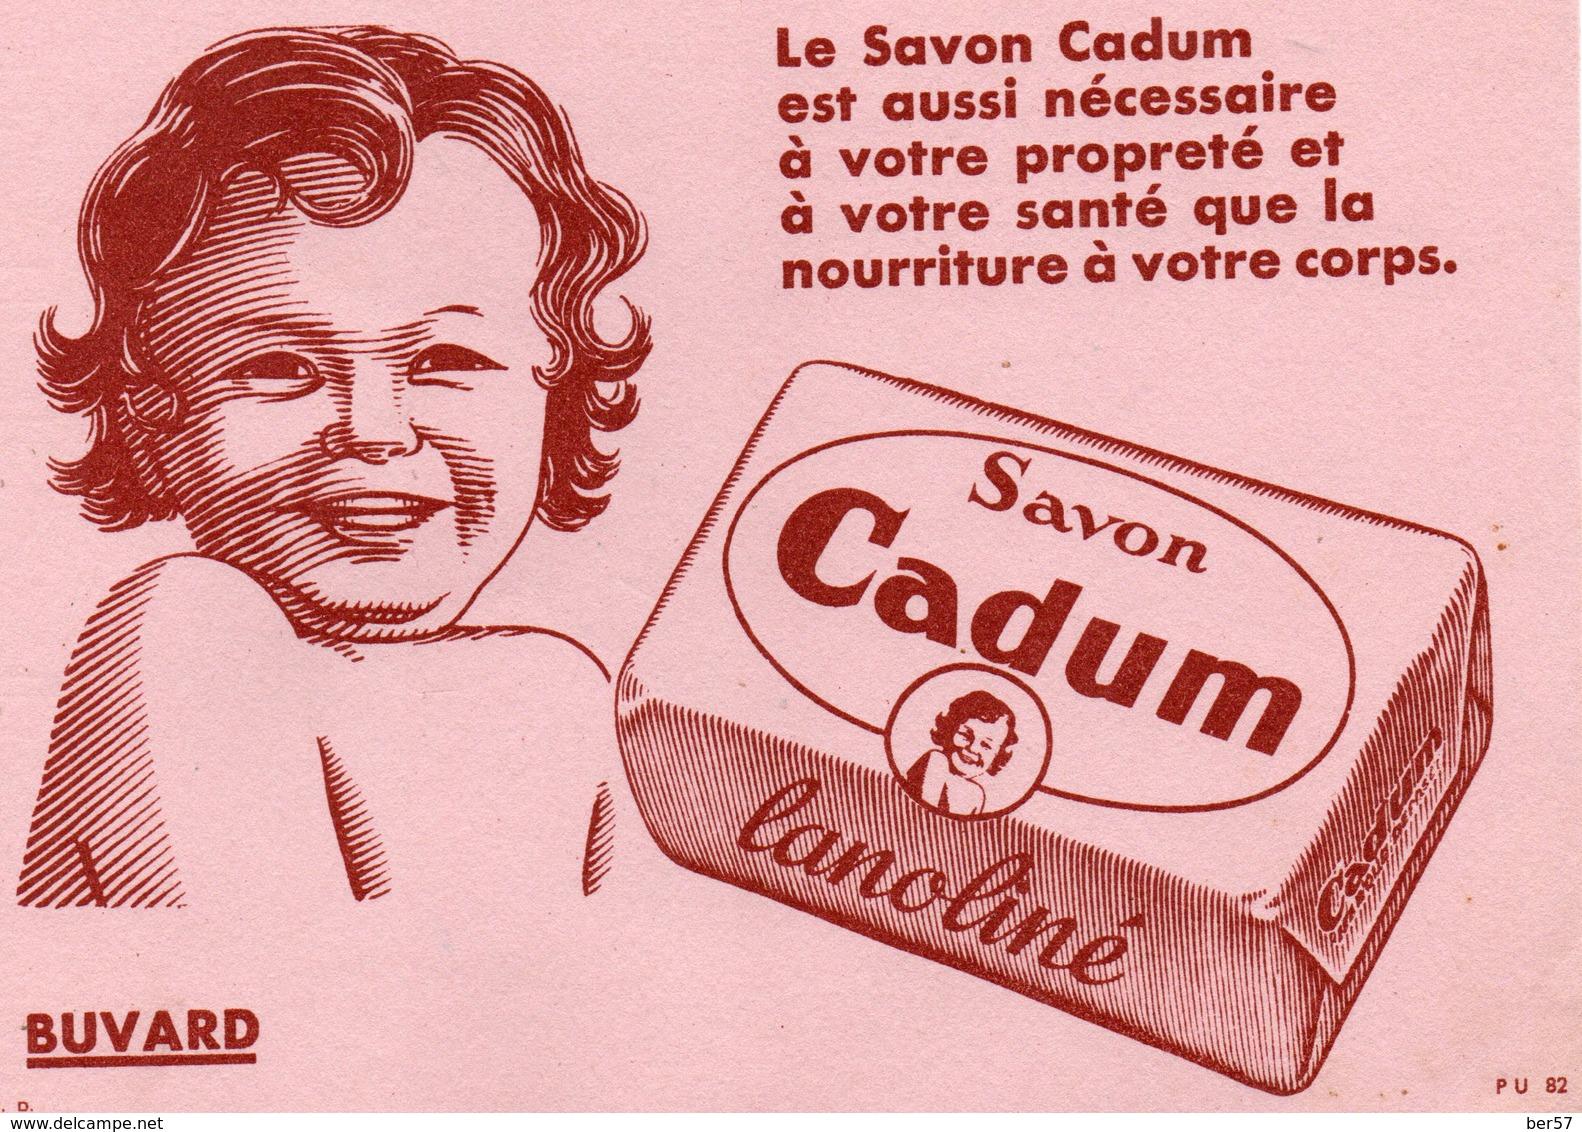 Buvard Ancien : Bébé CADUM - Savon - Parfums & Beauté